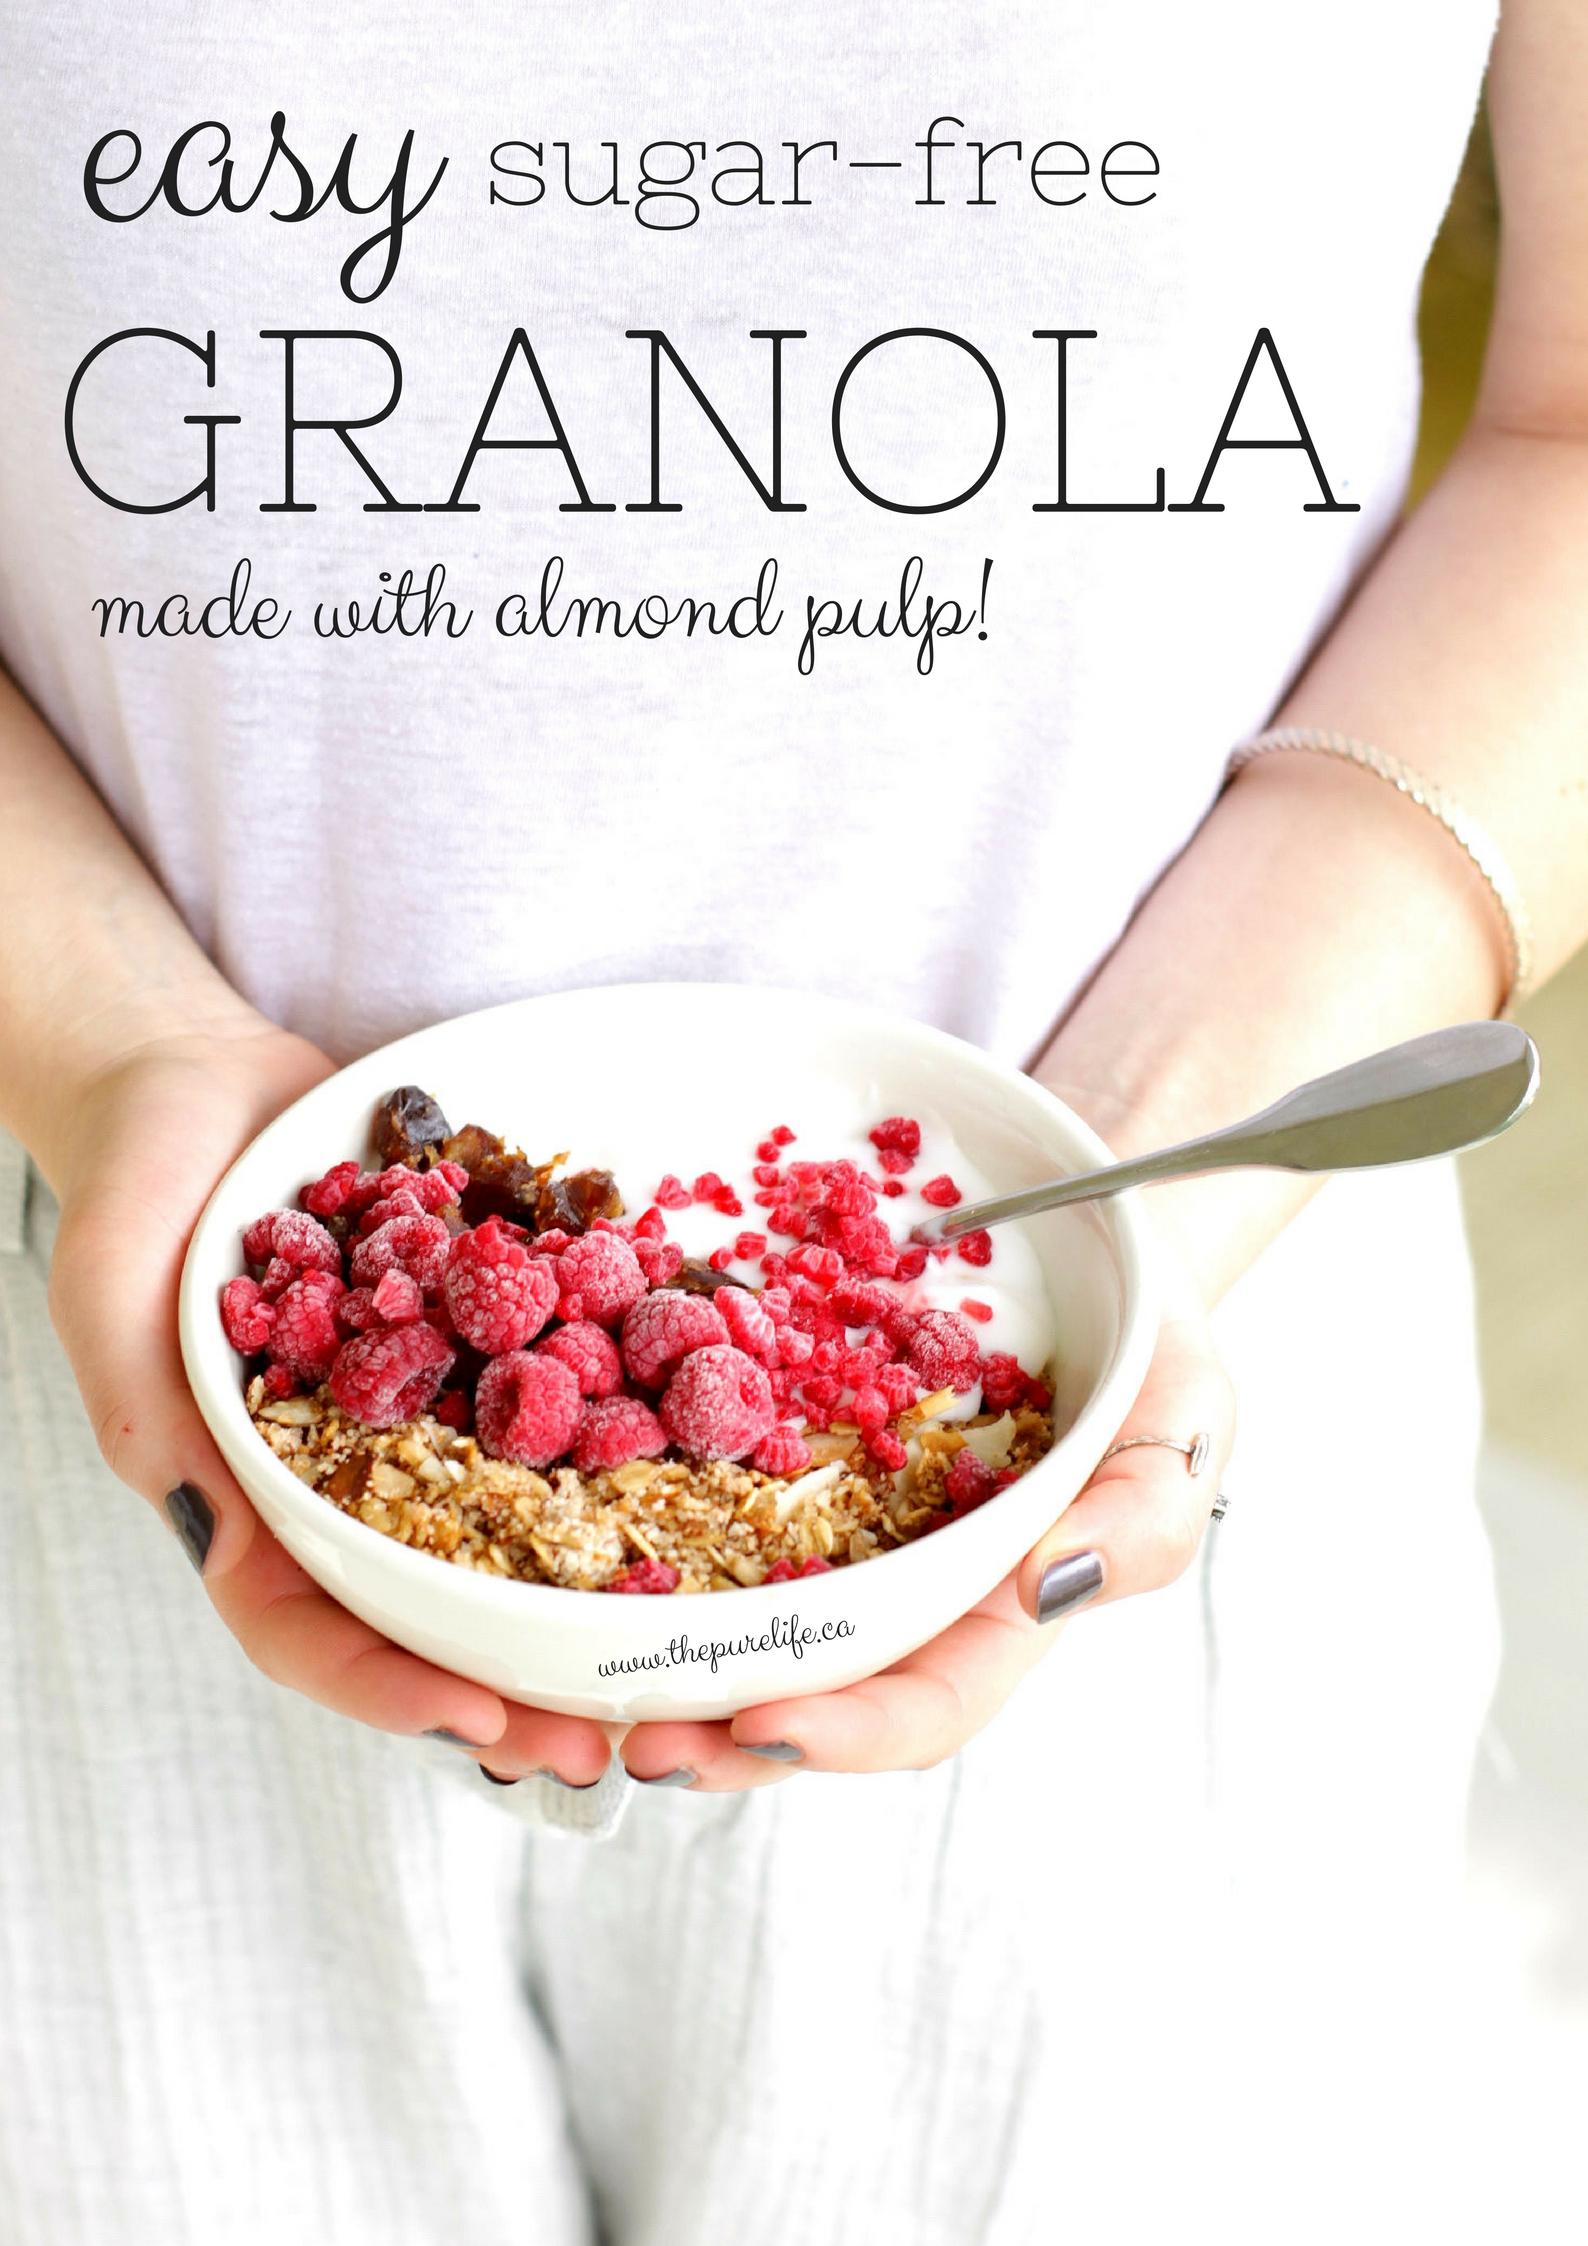 Easy Sugar-Free Almond Pulp Granola